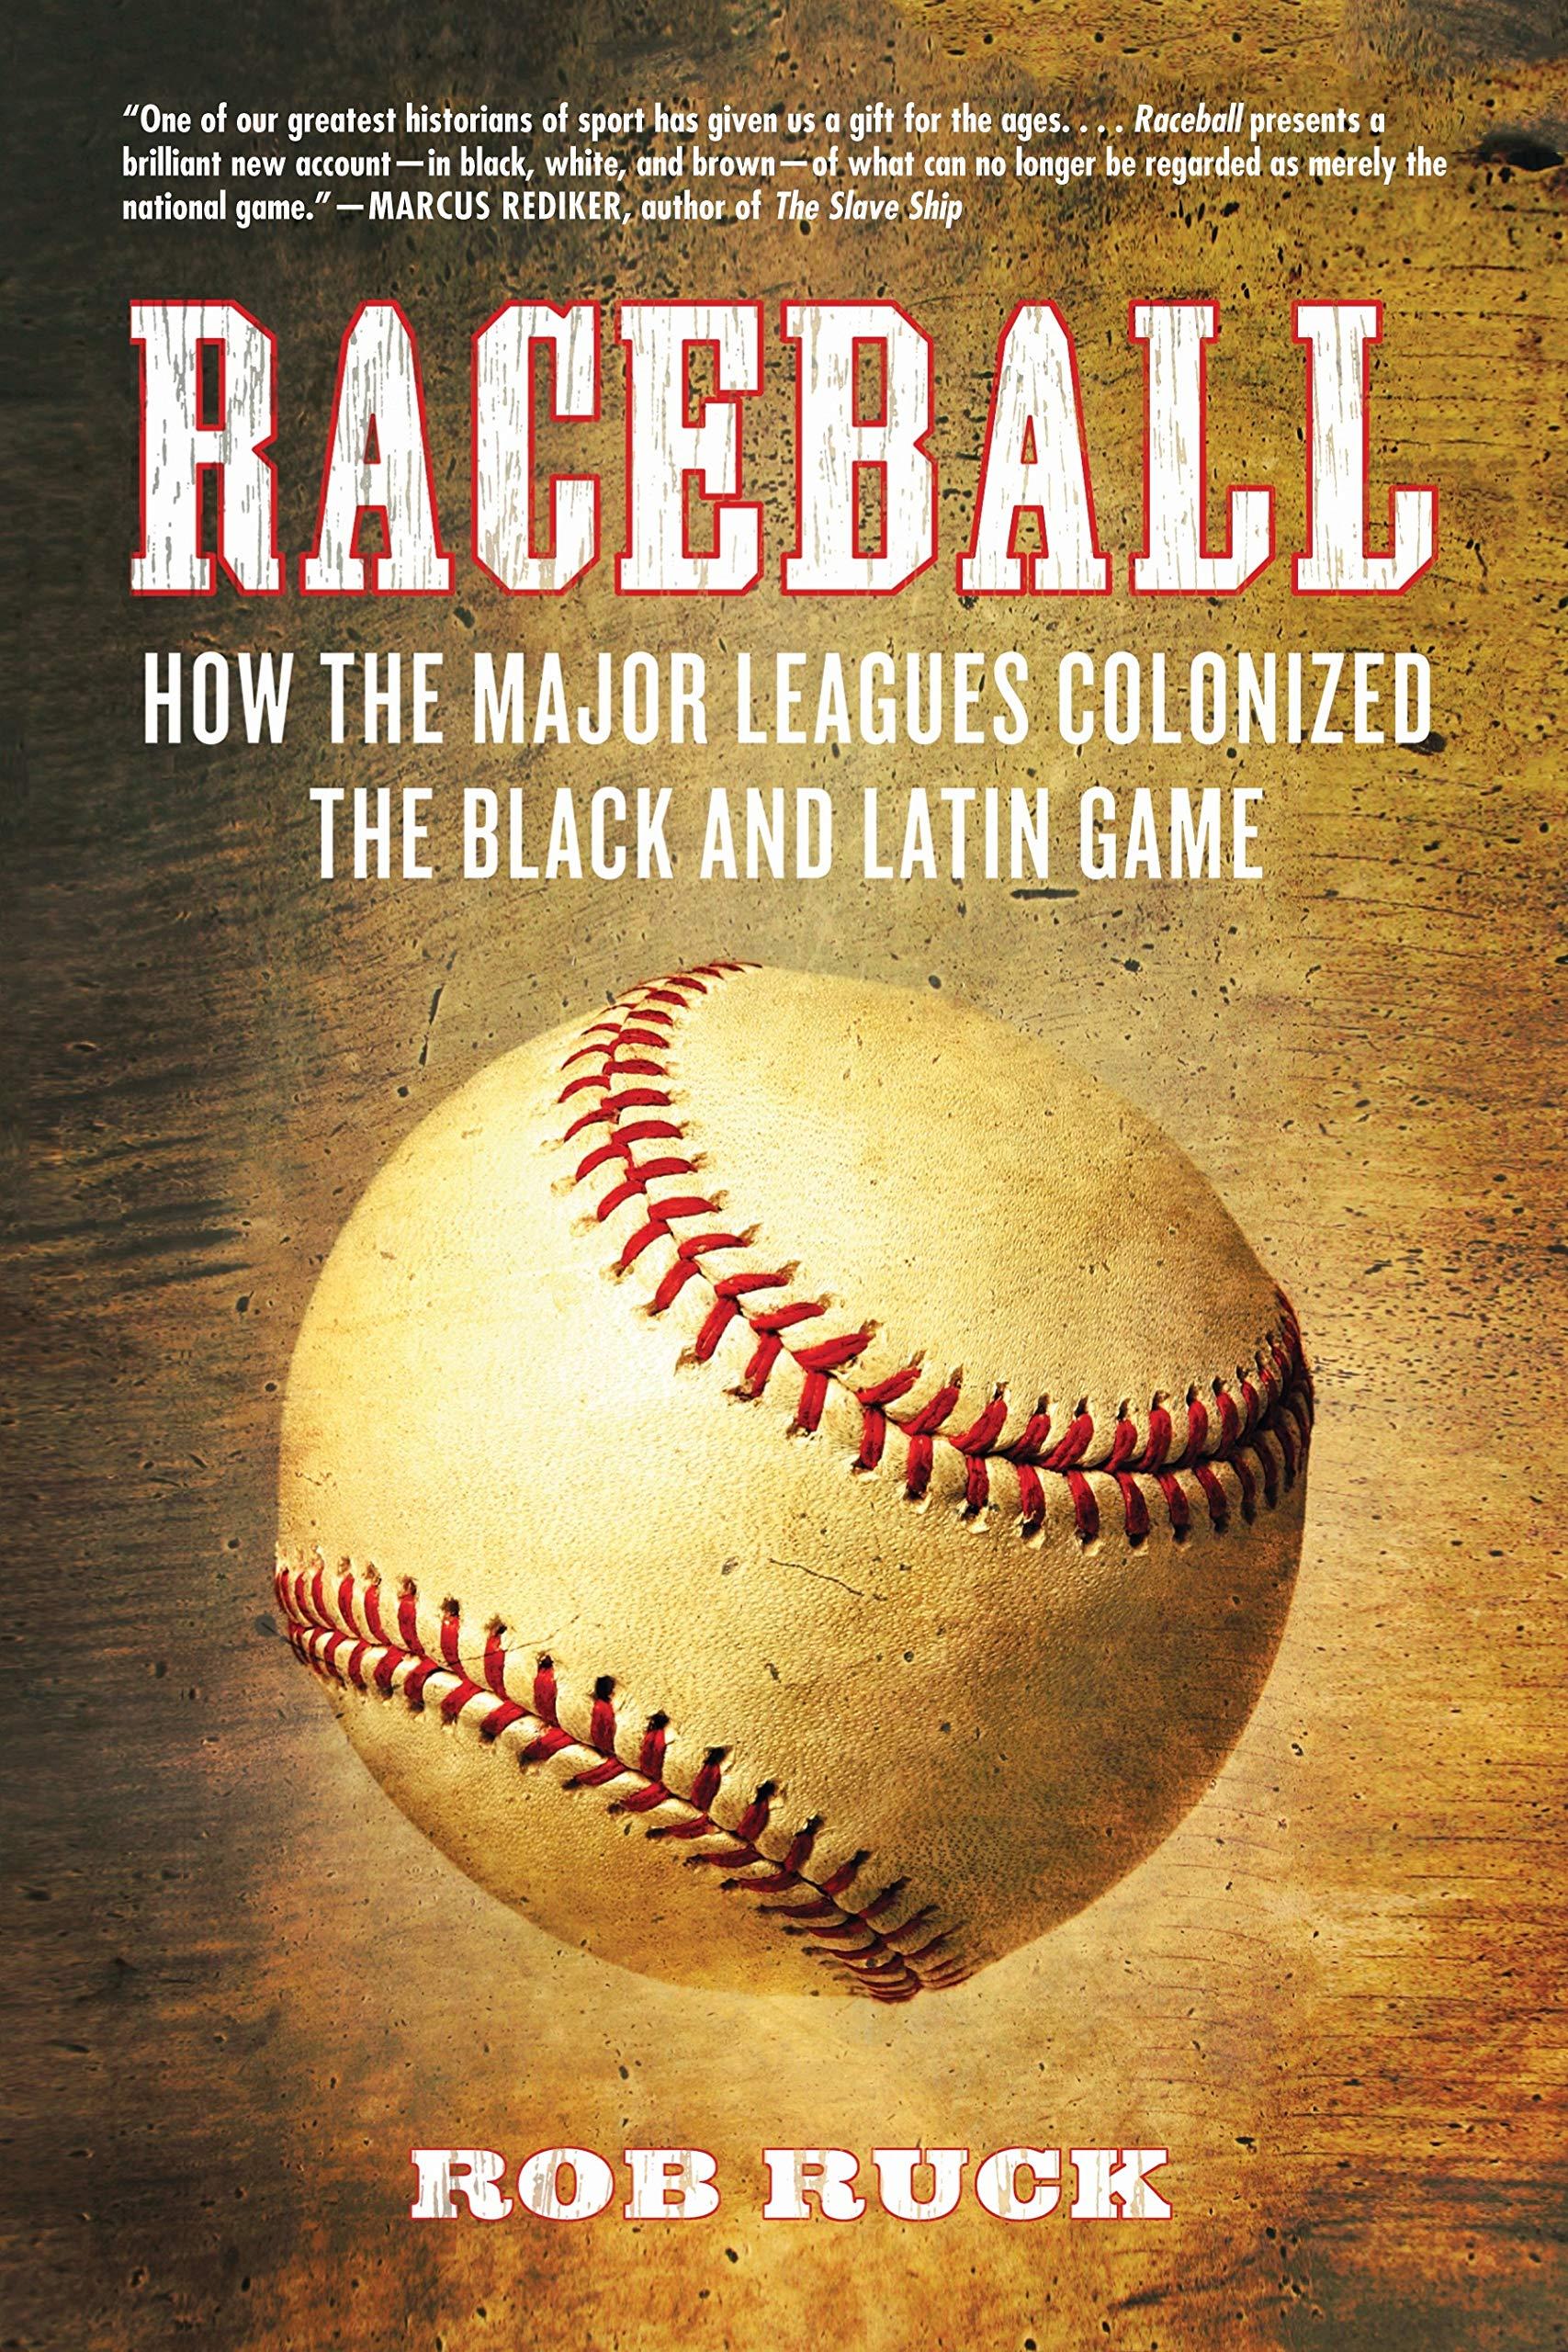 Raceball: How the Major Leagues Colonized the Black and Latin Game ePub fb2 ebook